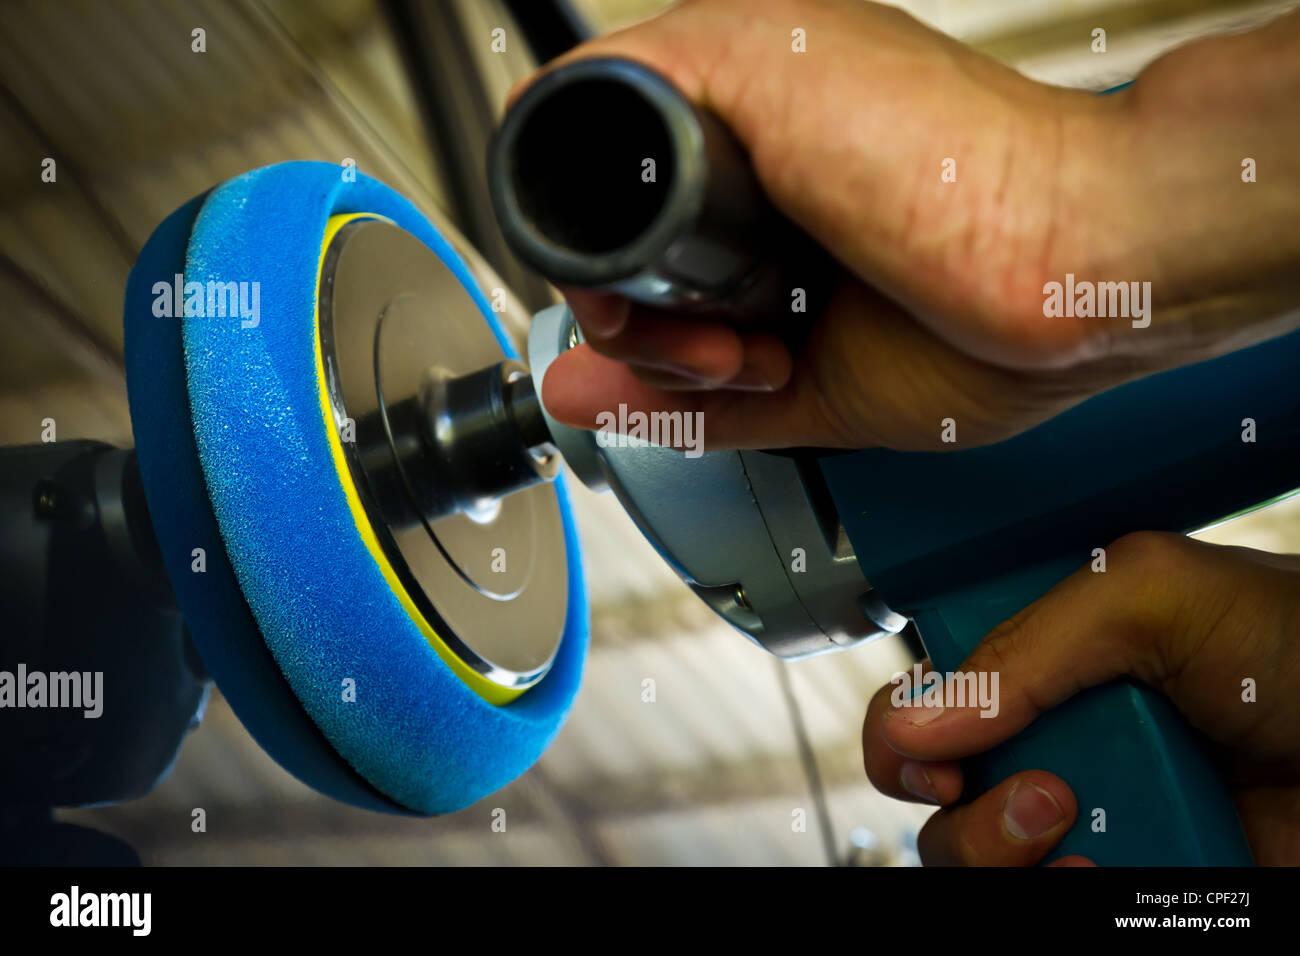 Hand holding car polisher - Stock Image